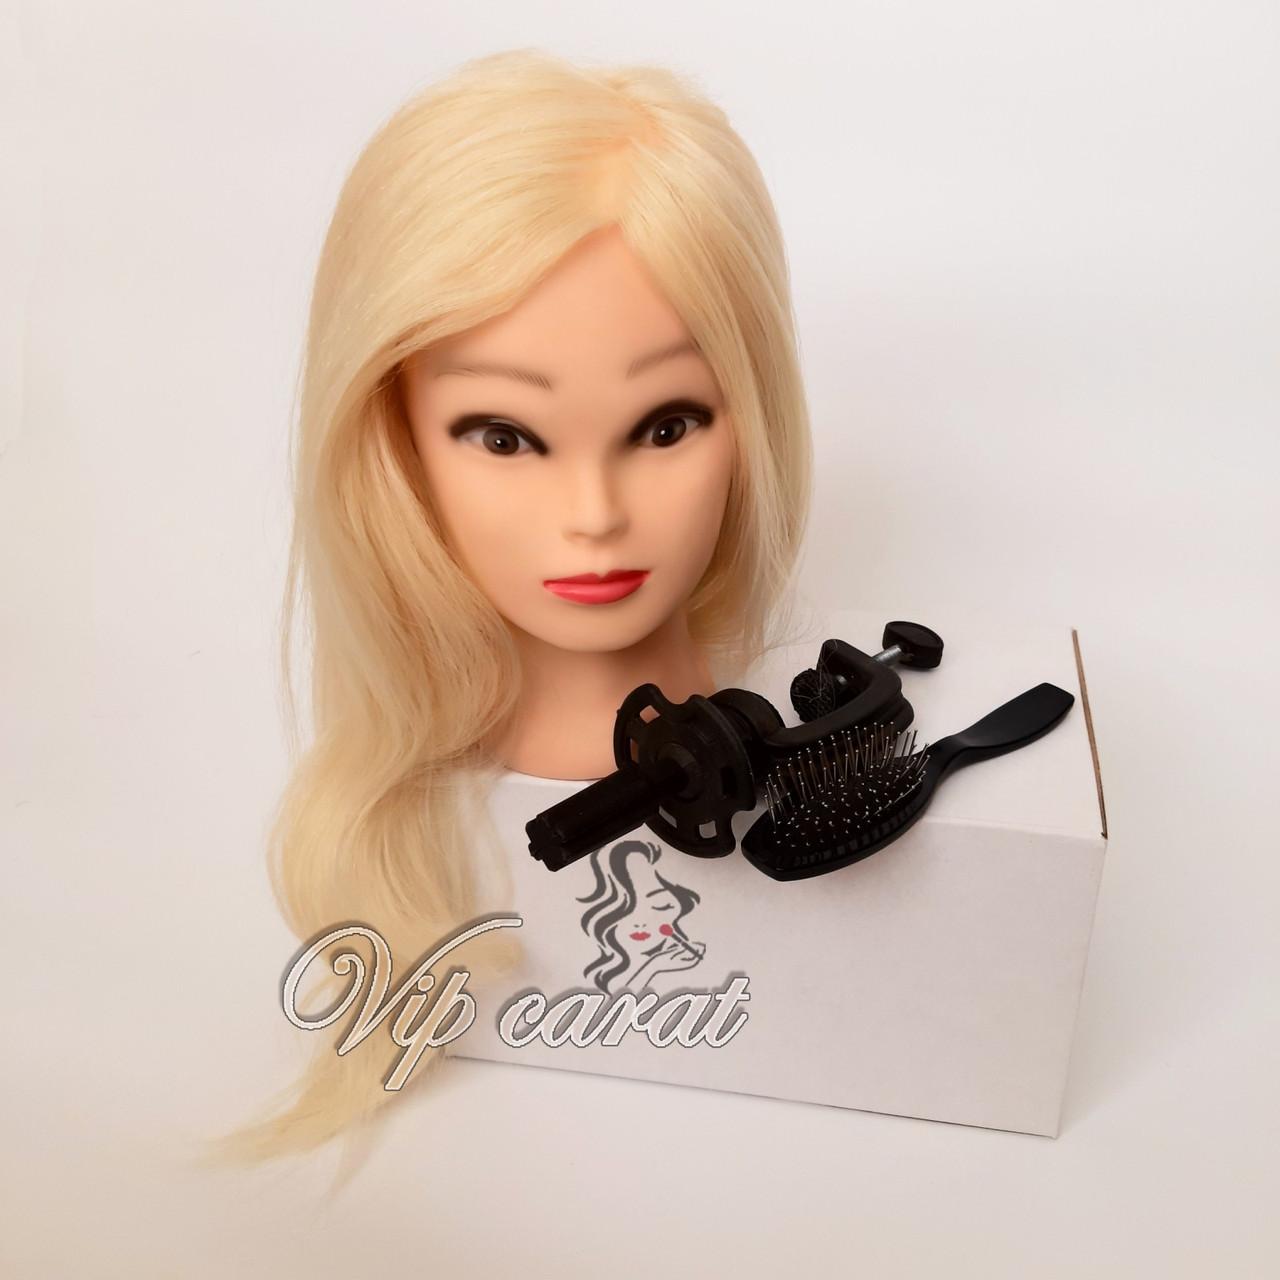 Навчальна голова манекен лялька для зачісок з натуральними волоссям 70%, блондинка / болванка для перукаря